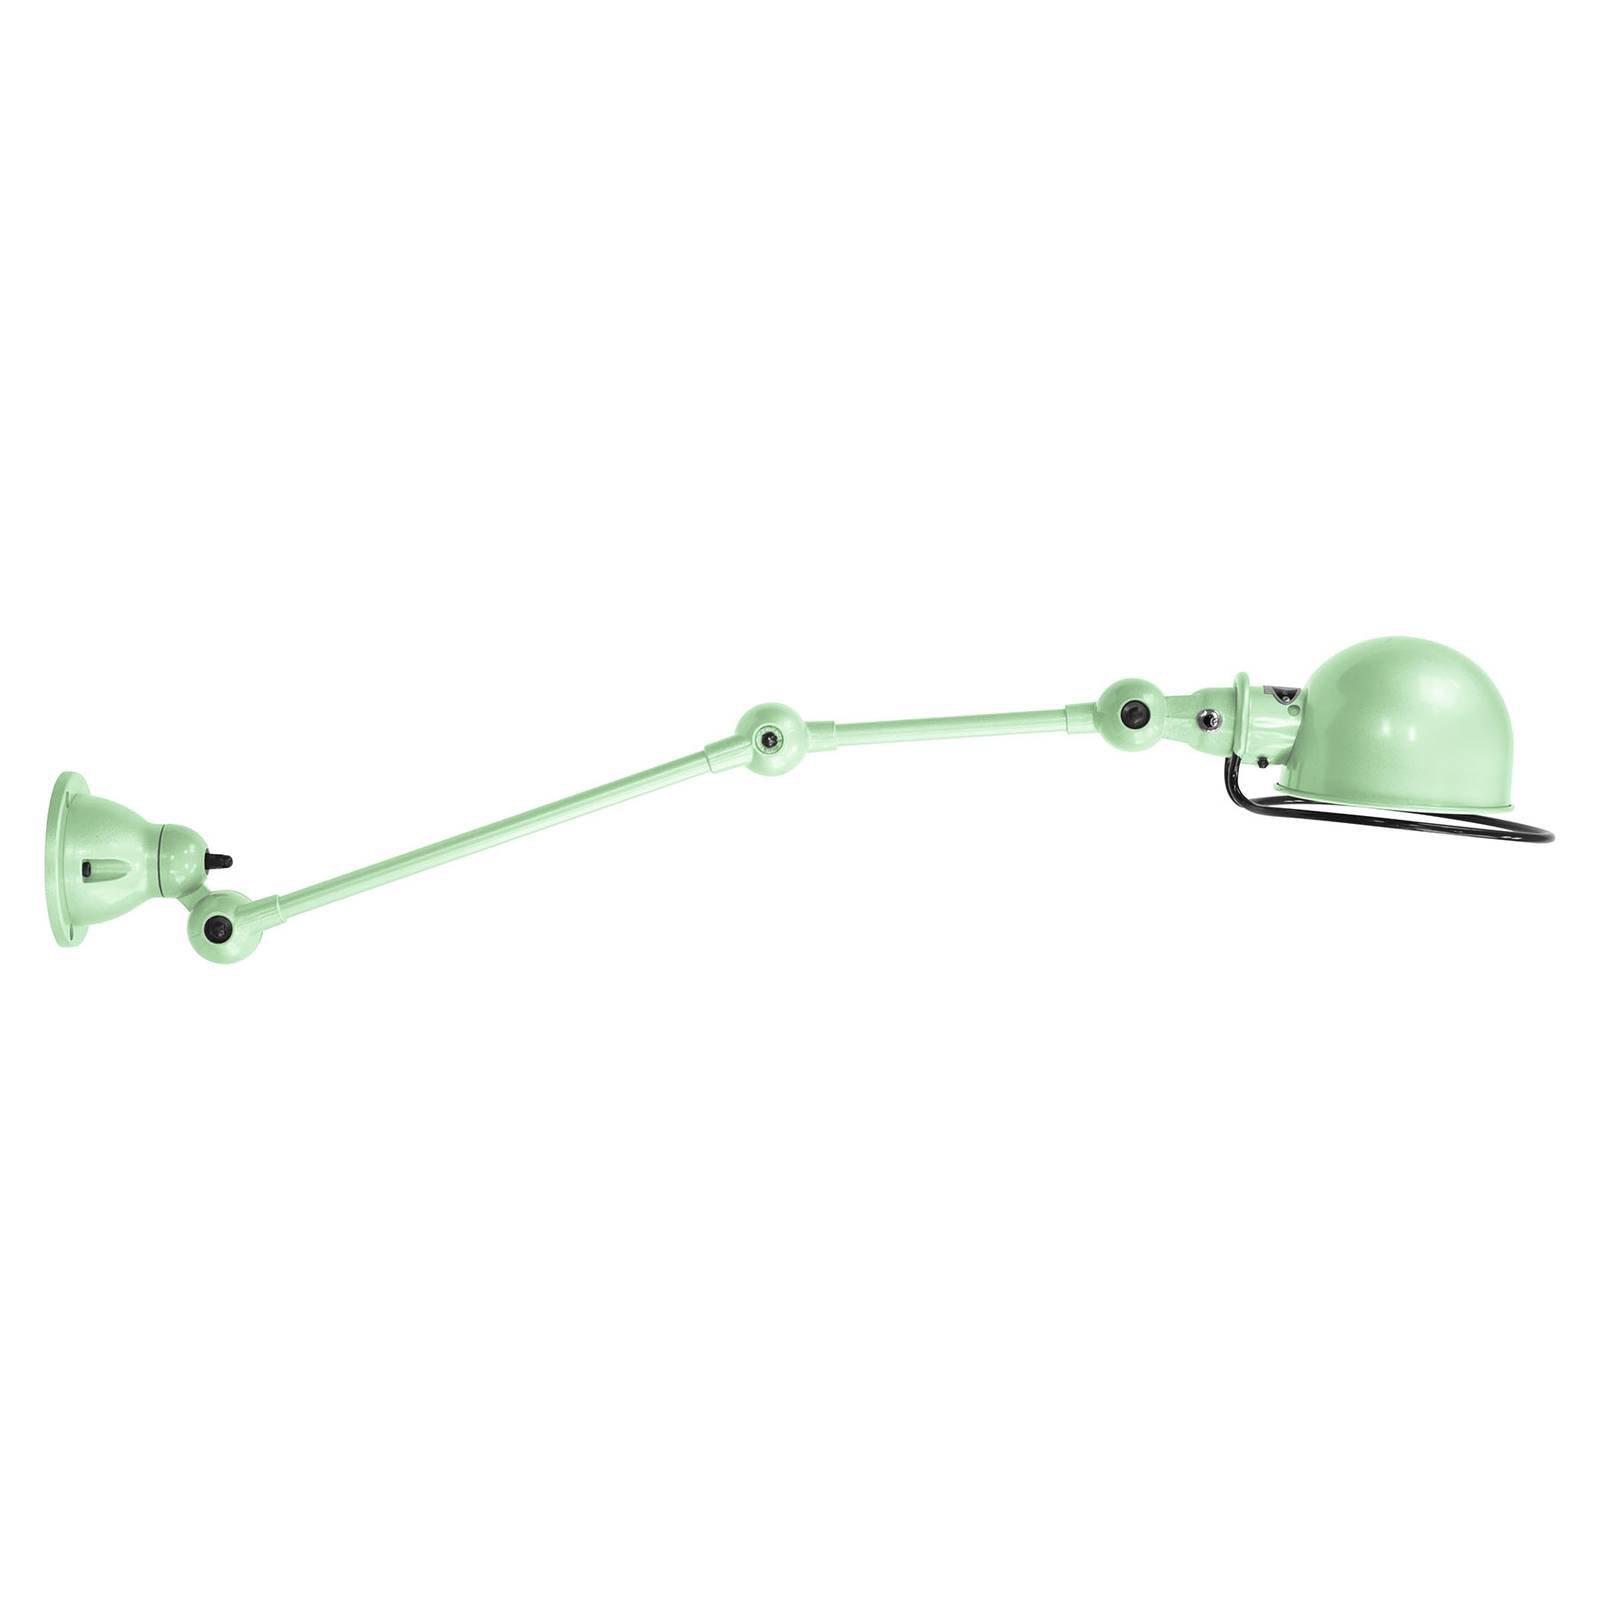 Jieldé Loft D4251 vegglampe, leddarm, mintgrønn